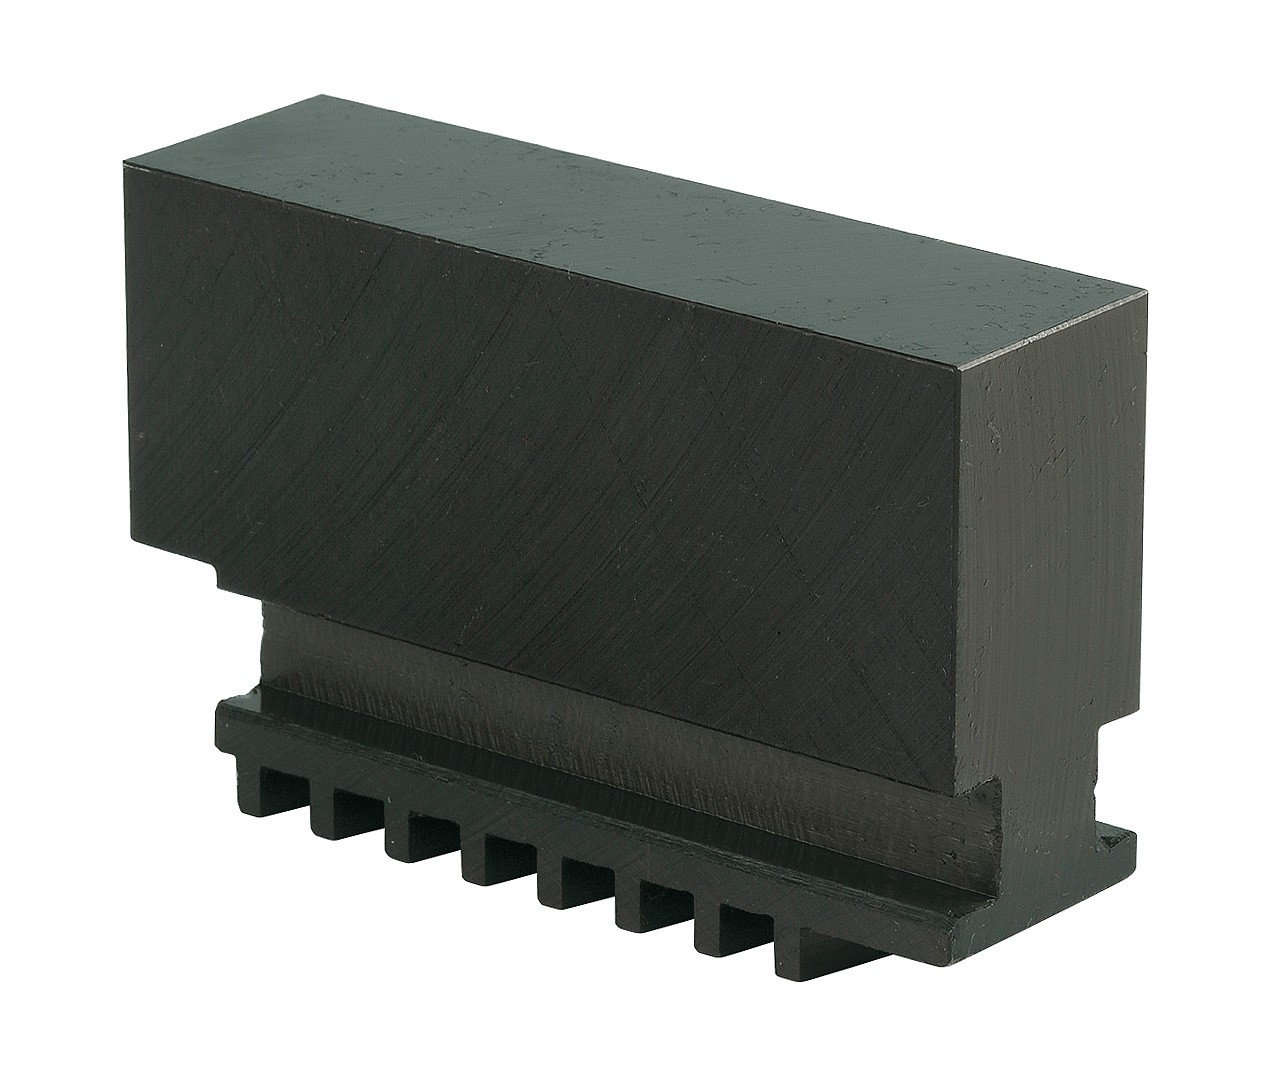 Szczęki jednolite miękkie - komplet DSJ-DK11-125 BERNARDO